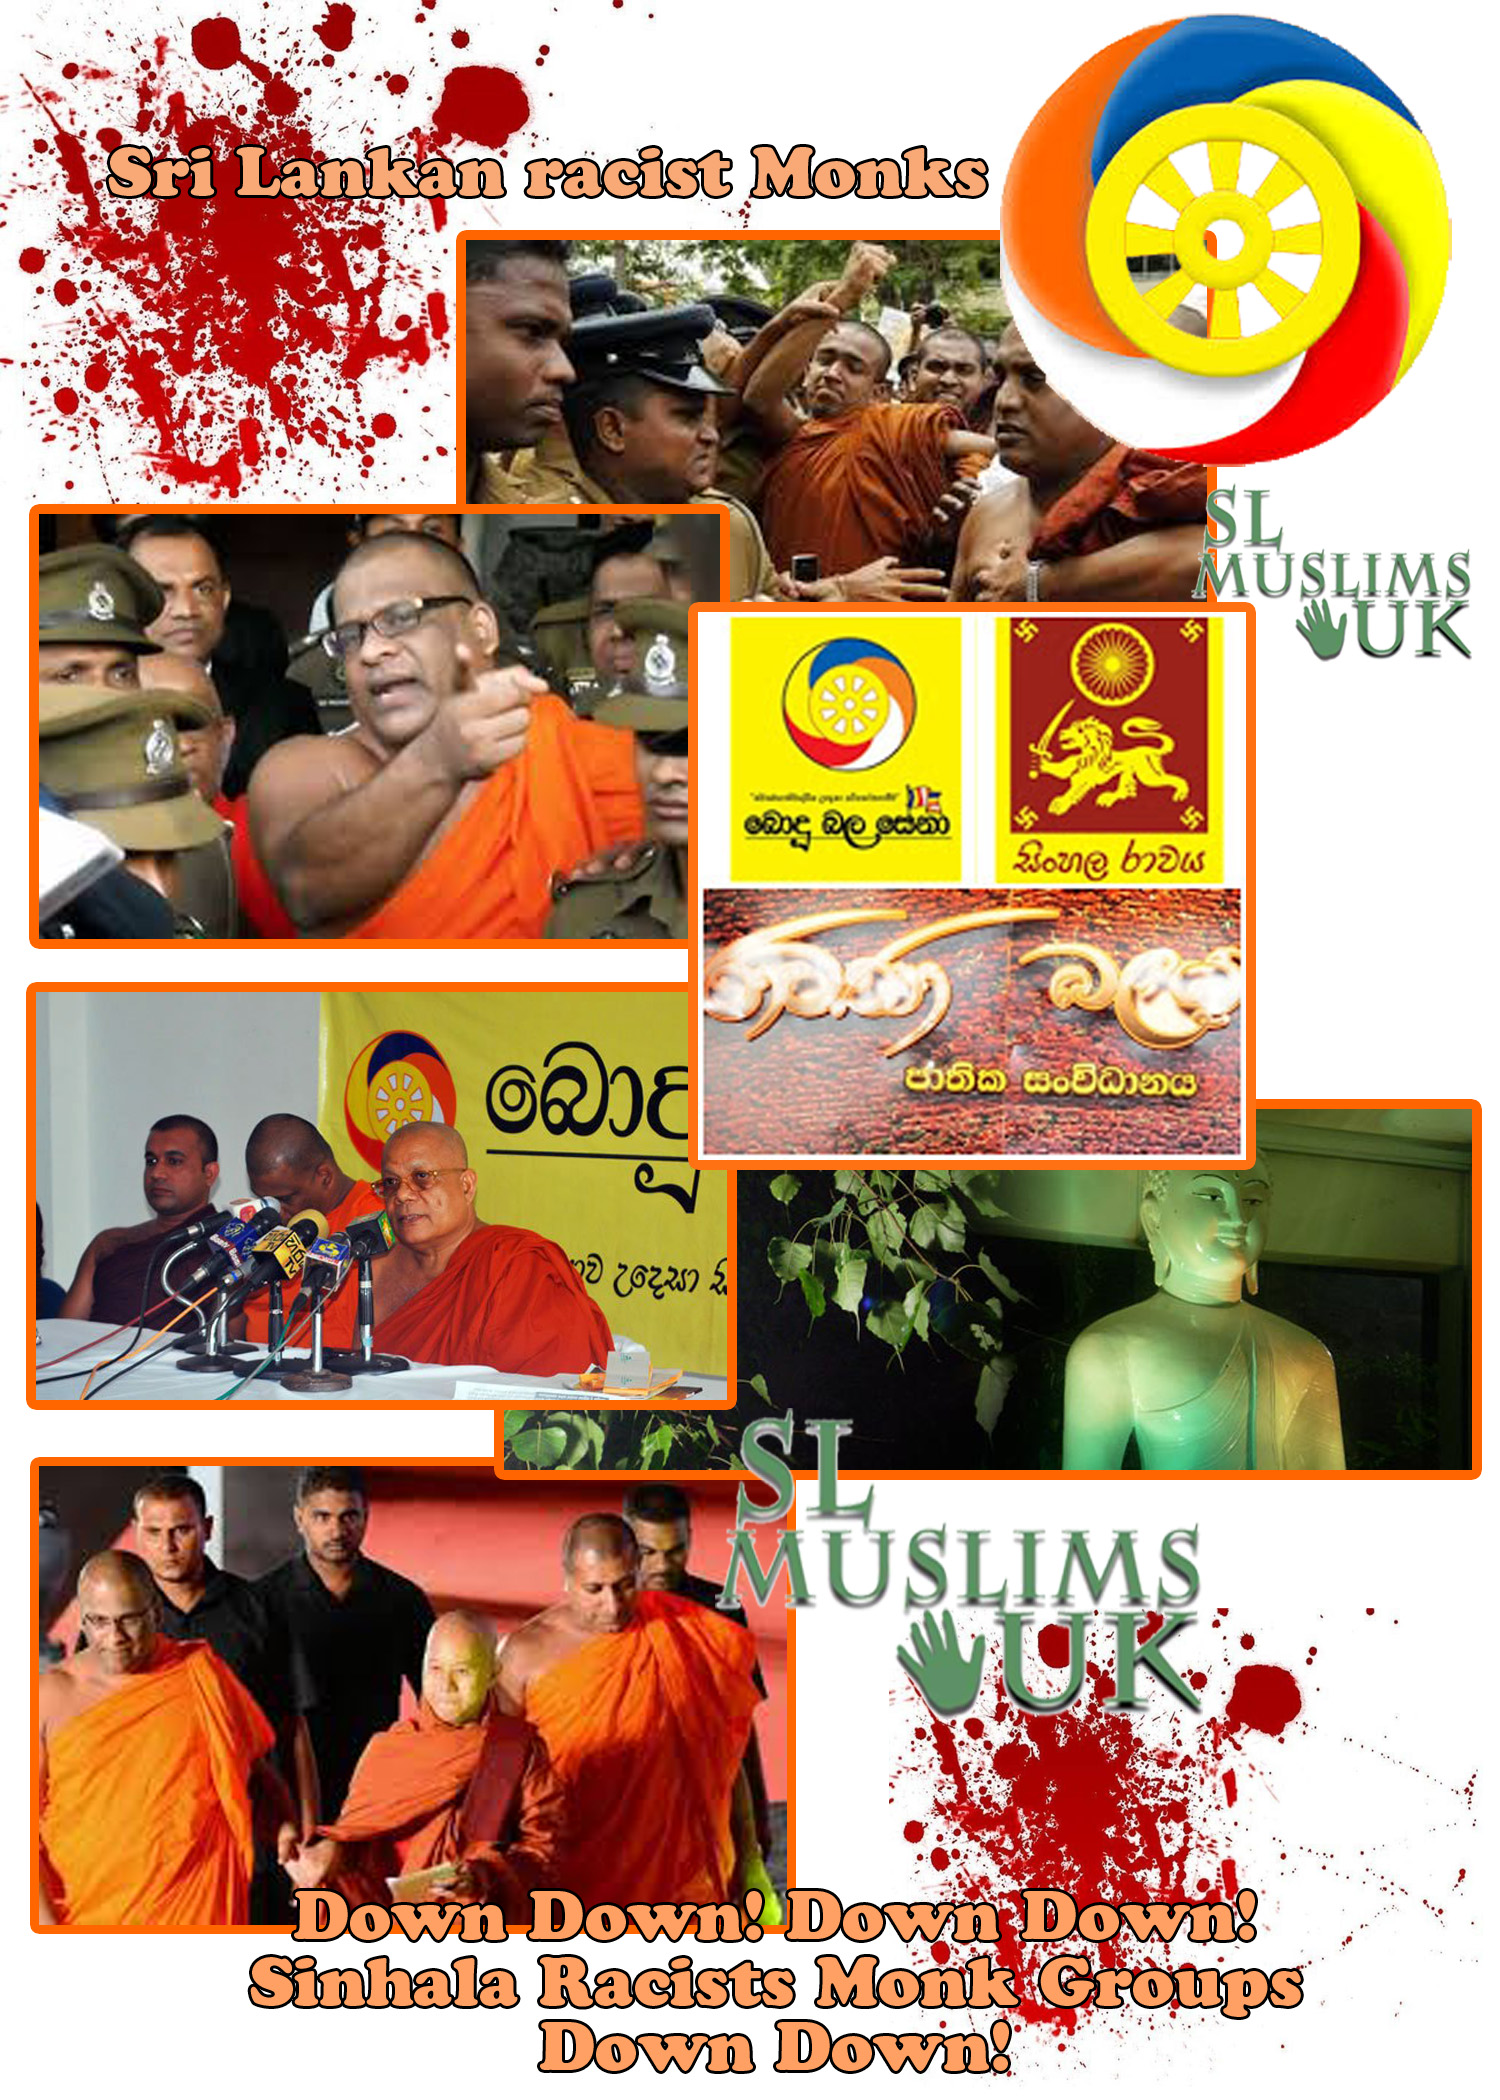 Sri Lankan Racist Monks